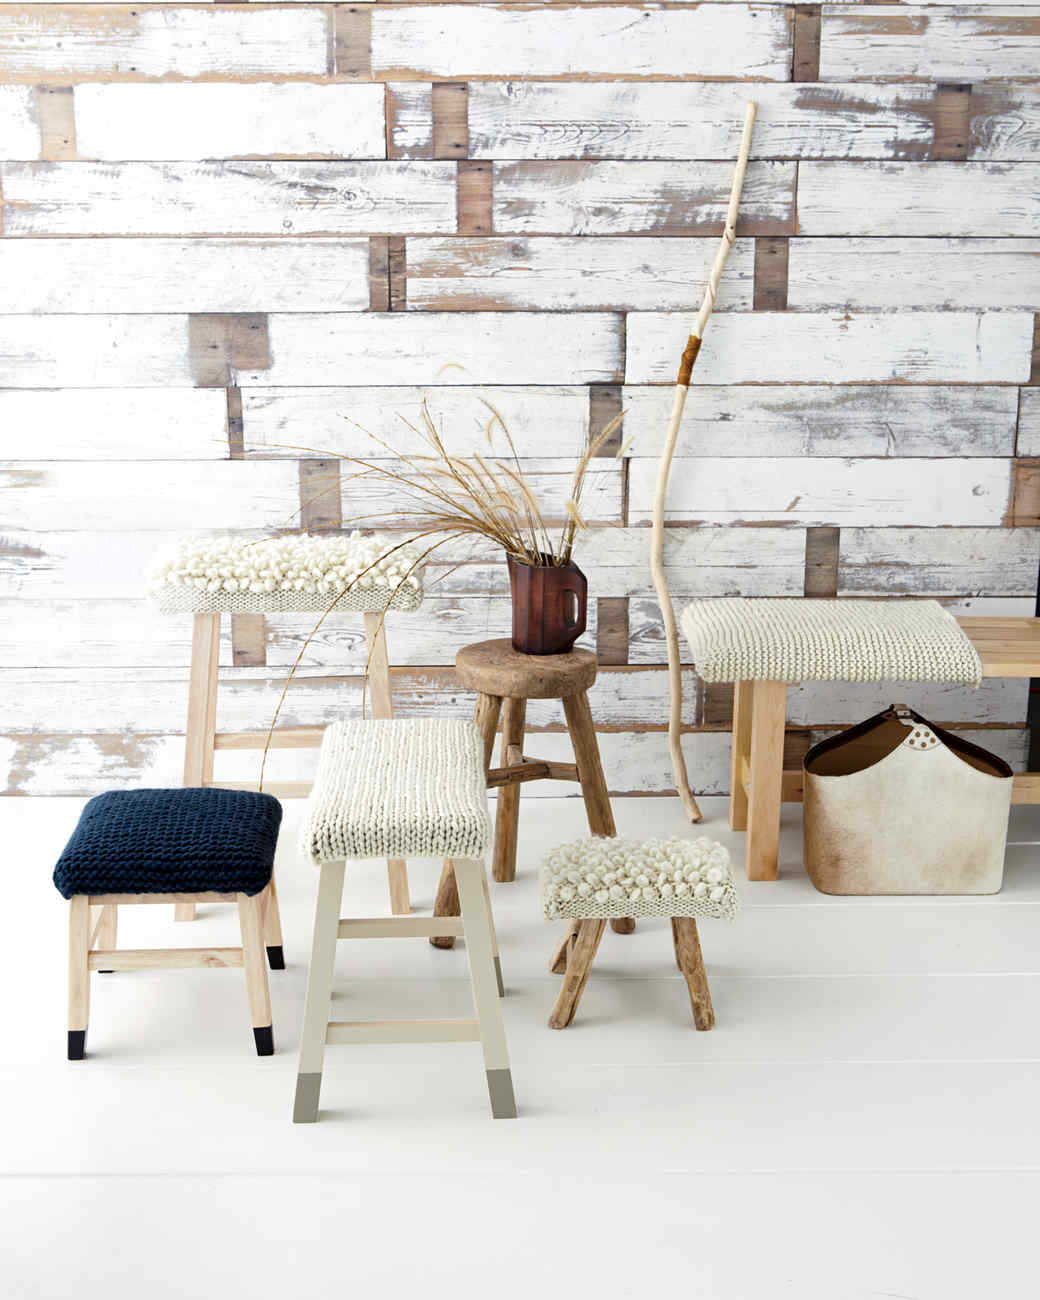 wool-stool-md107386.jpg